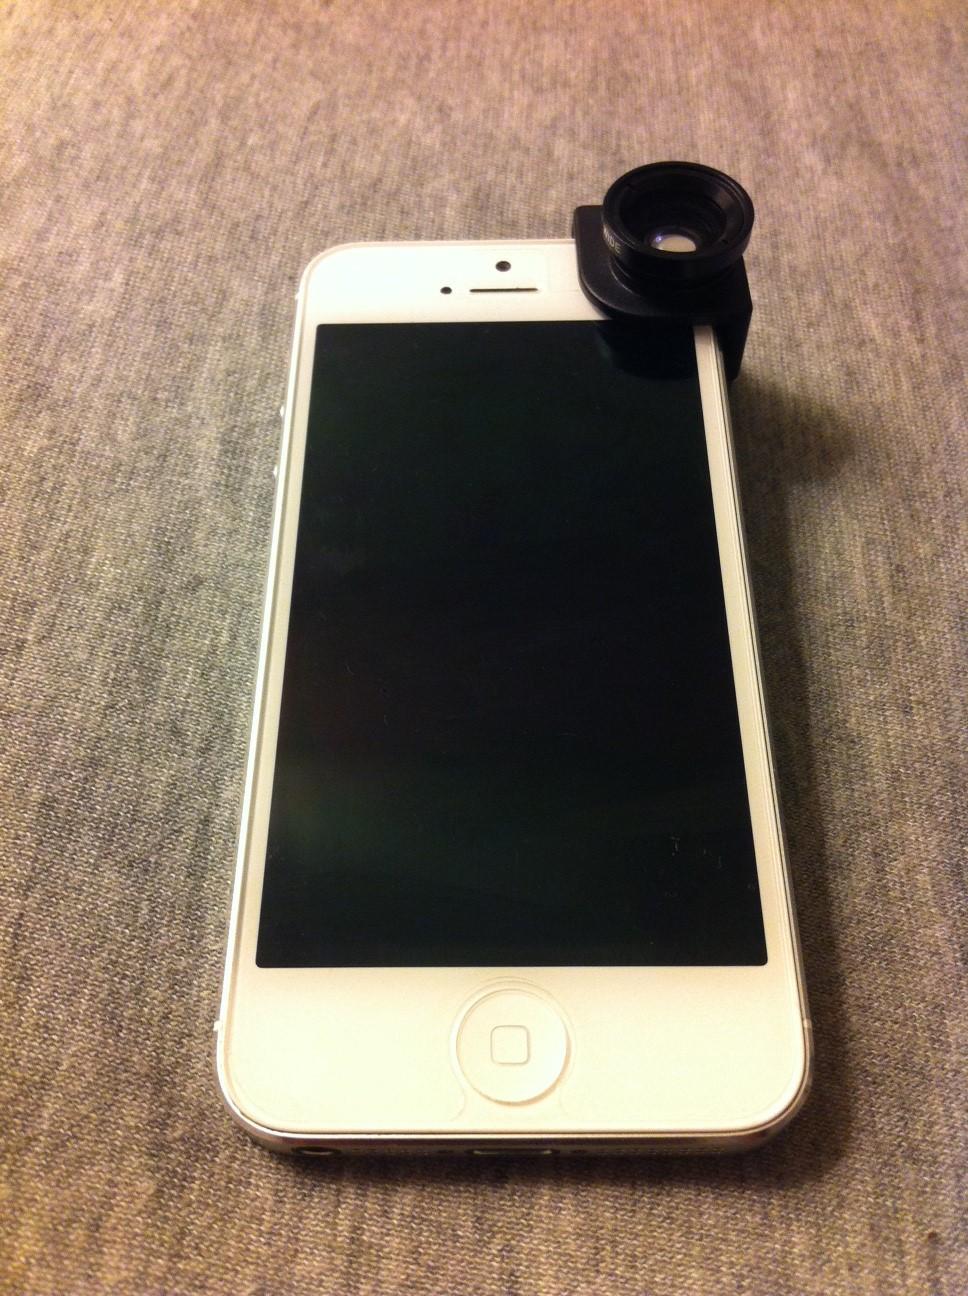 kit objectif iphone 5 avant.JPG - Test : Kit objectif photo 3 en 1 pour iPhone 5